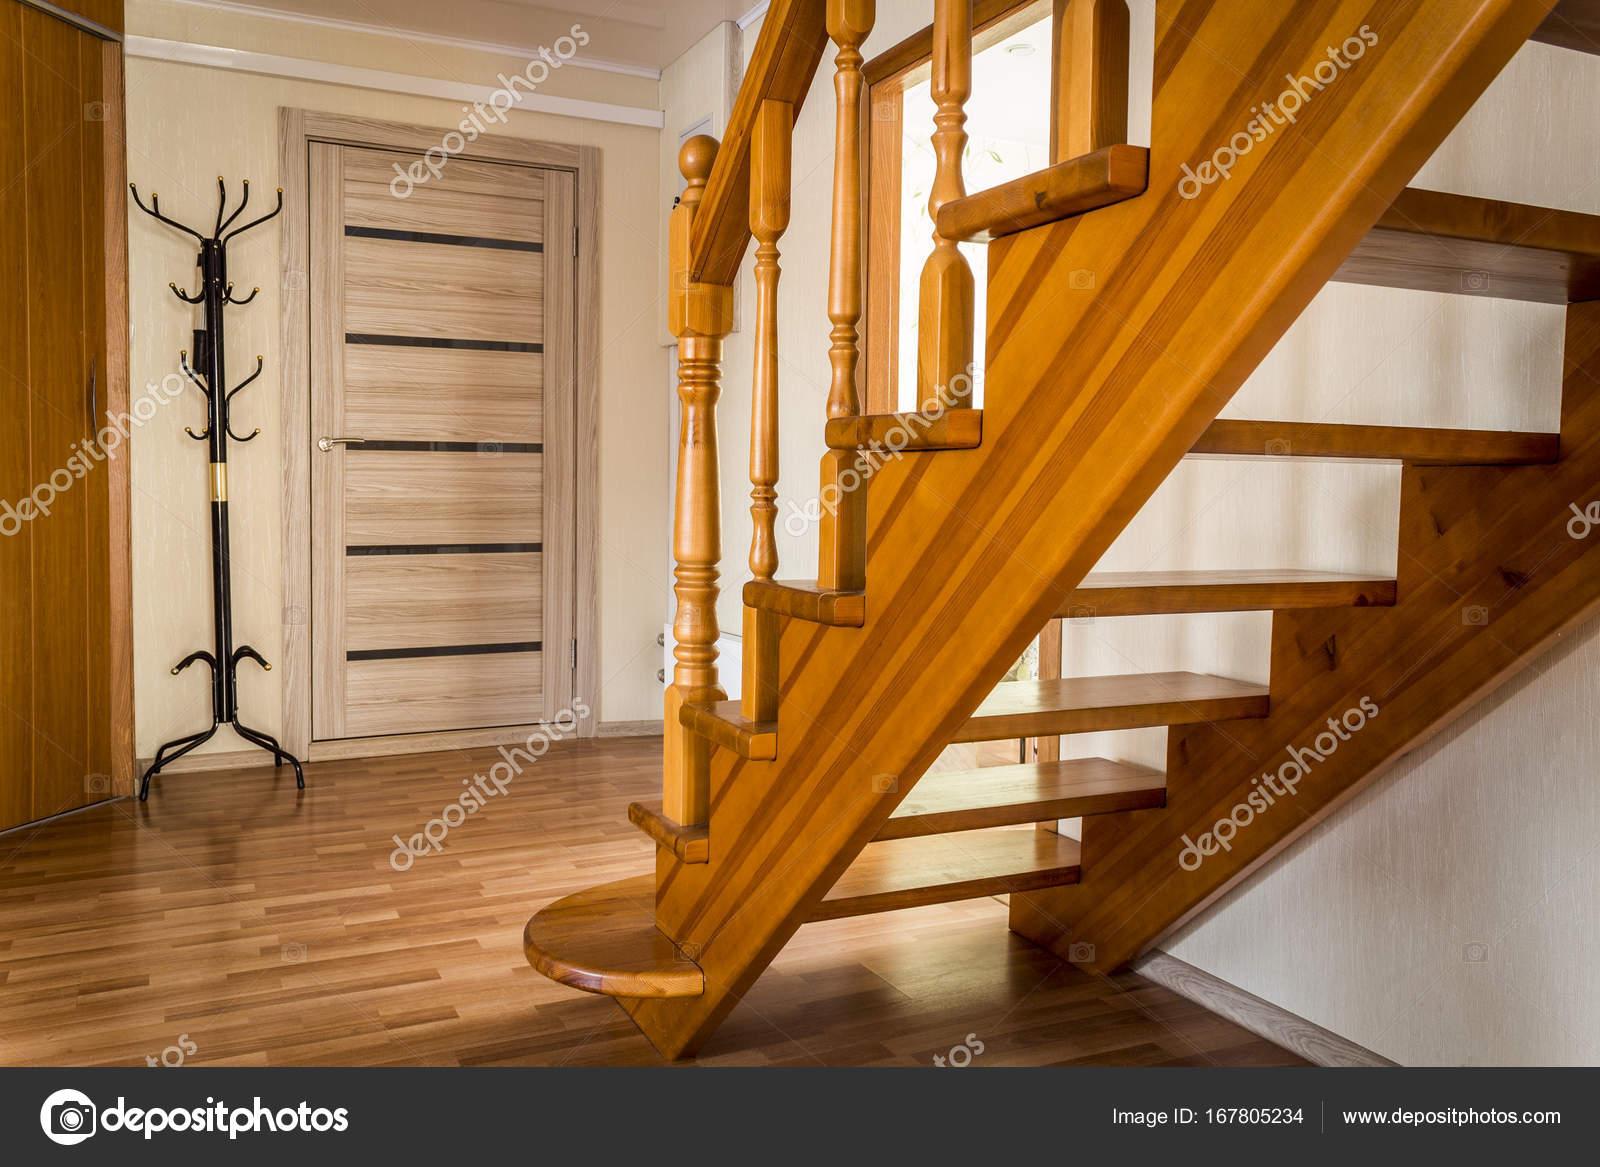 Pasos escalera madera pasos de escaleras madera foto for Escalera de madera 5 pasos